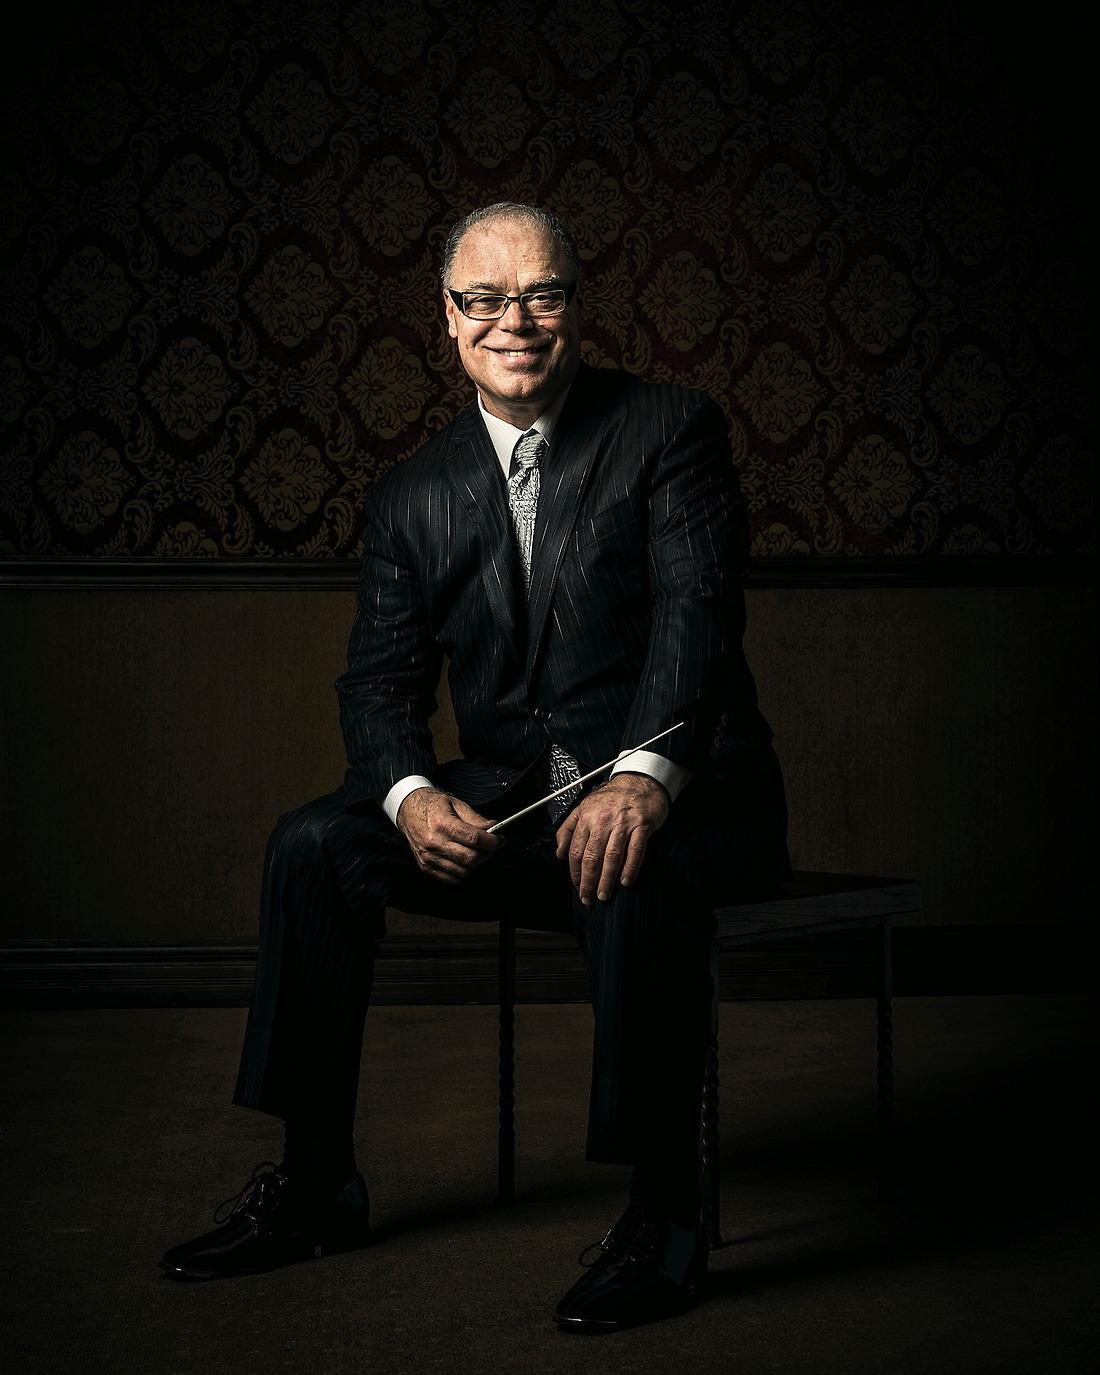 Jeff Tyzik World-Renowned Pops Symphony Conductor / Arranger and Jazz Trumpet Soloist. — © Jeremy Lock/